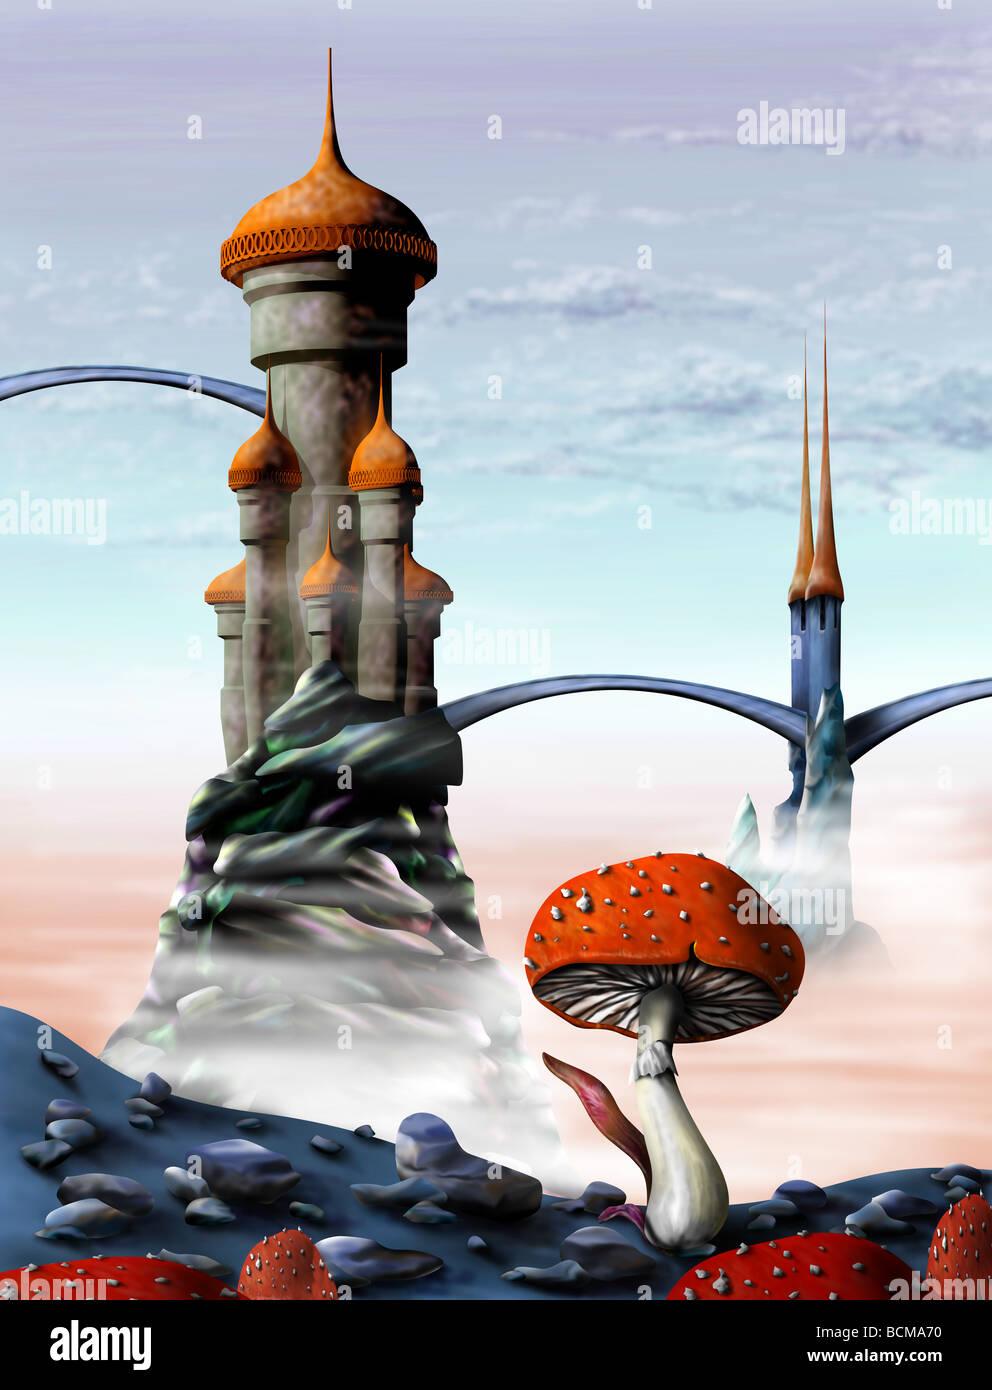 Illustration of a fantasy castle in an alien world - Stock Image